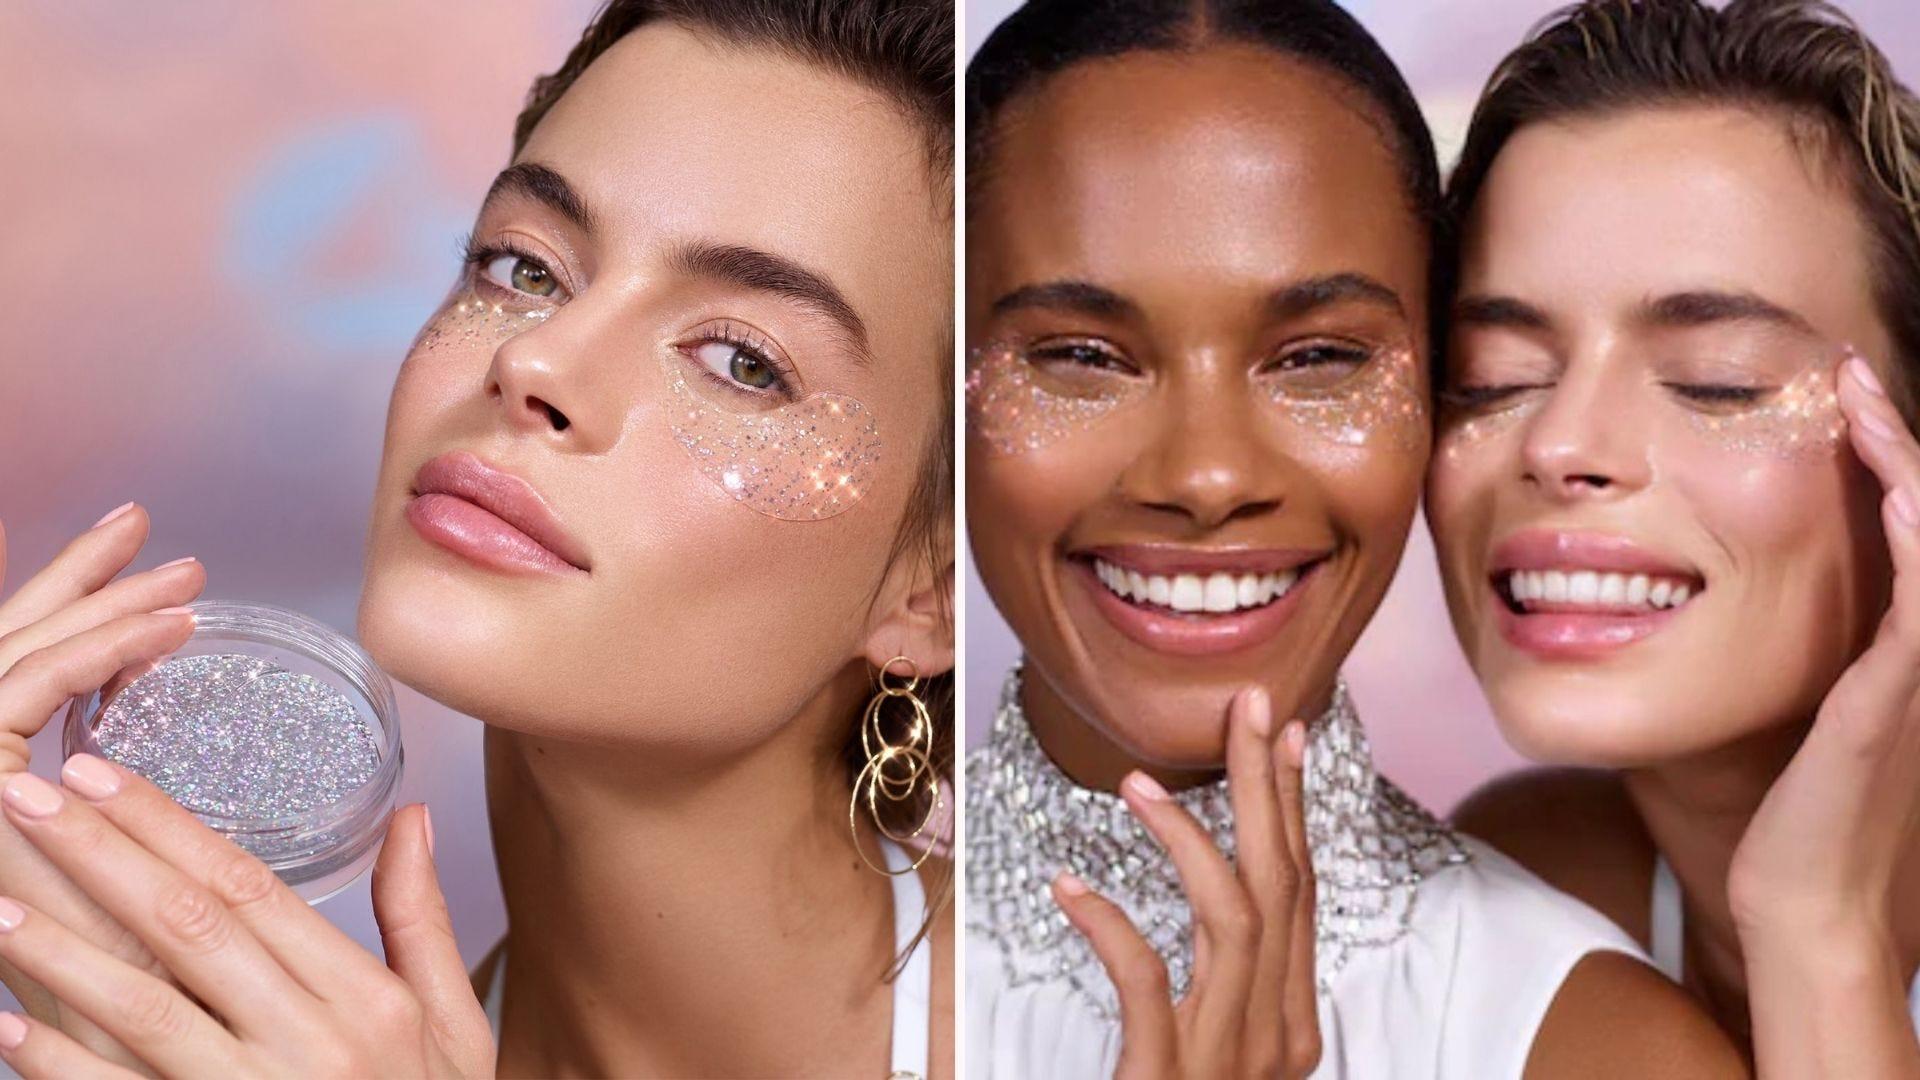 Women wearing transparent glitter under eye patches